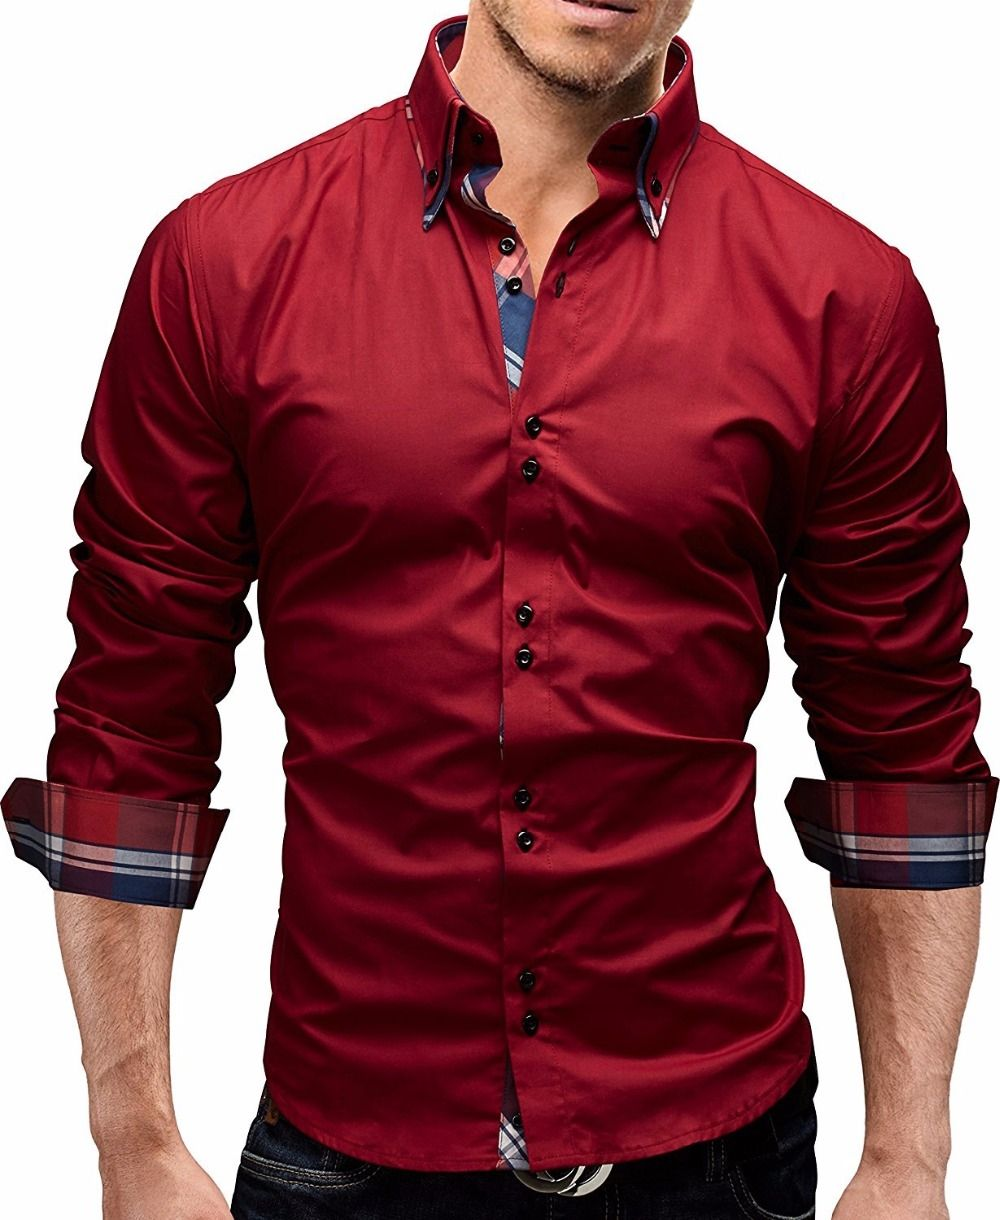 Men shirt spring new brand business menus slim fit dress shirt